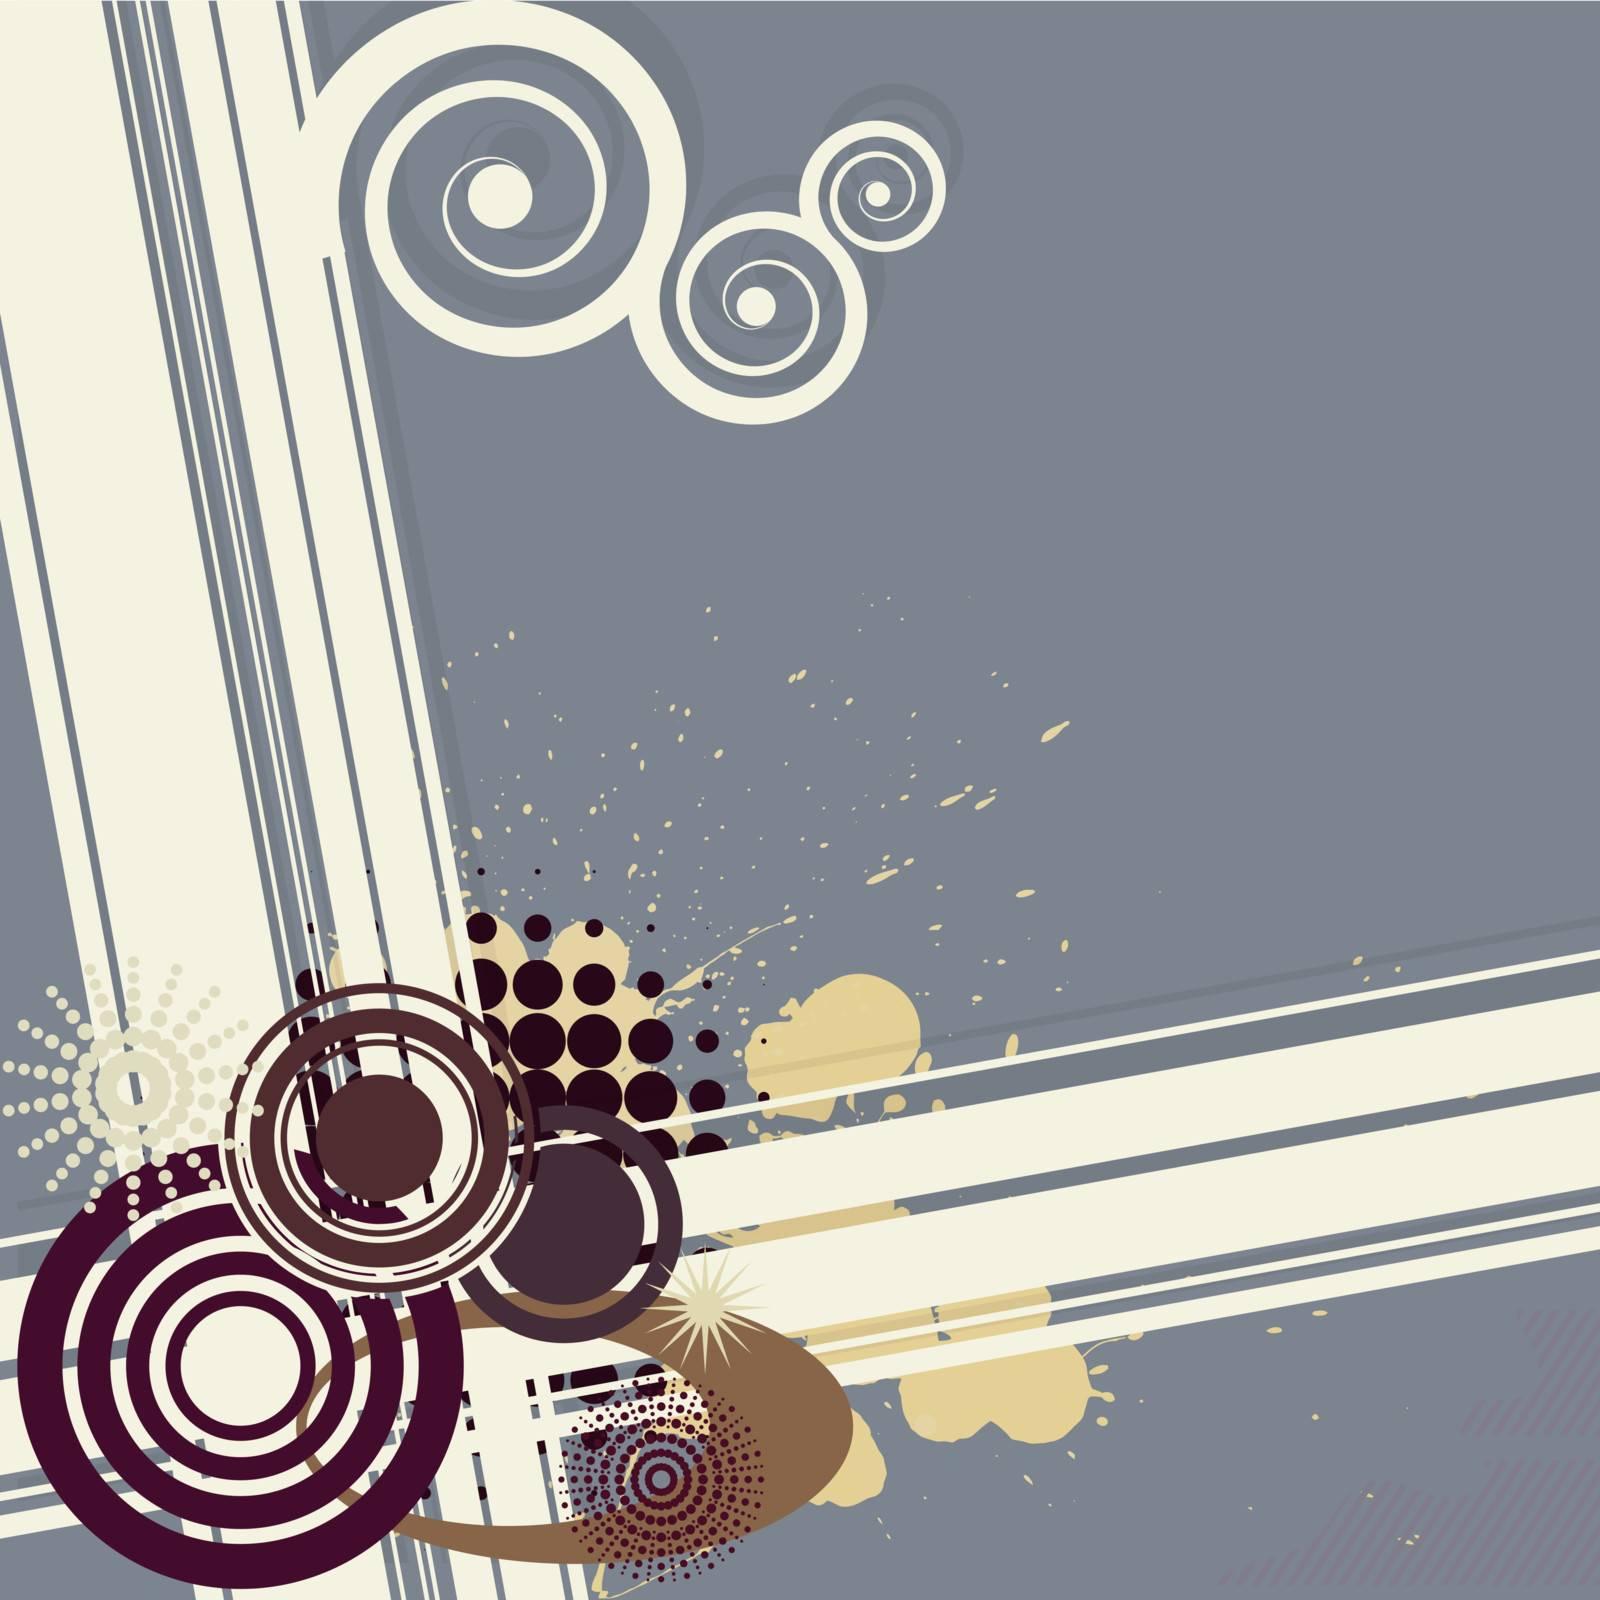 Retro background. eps10